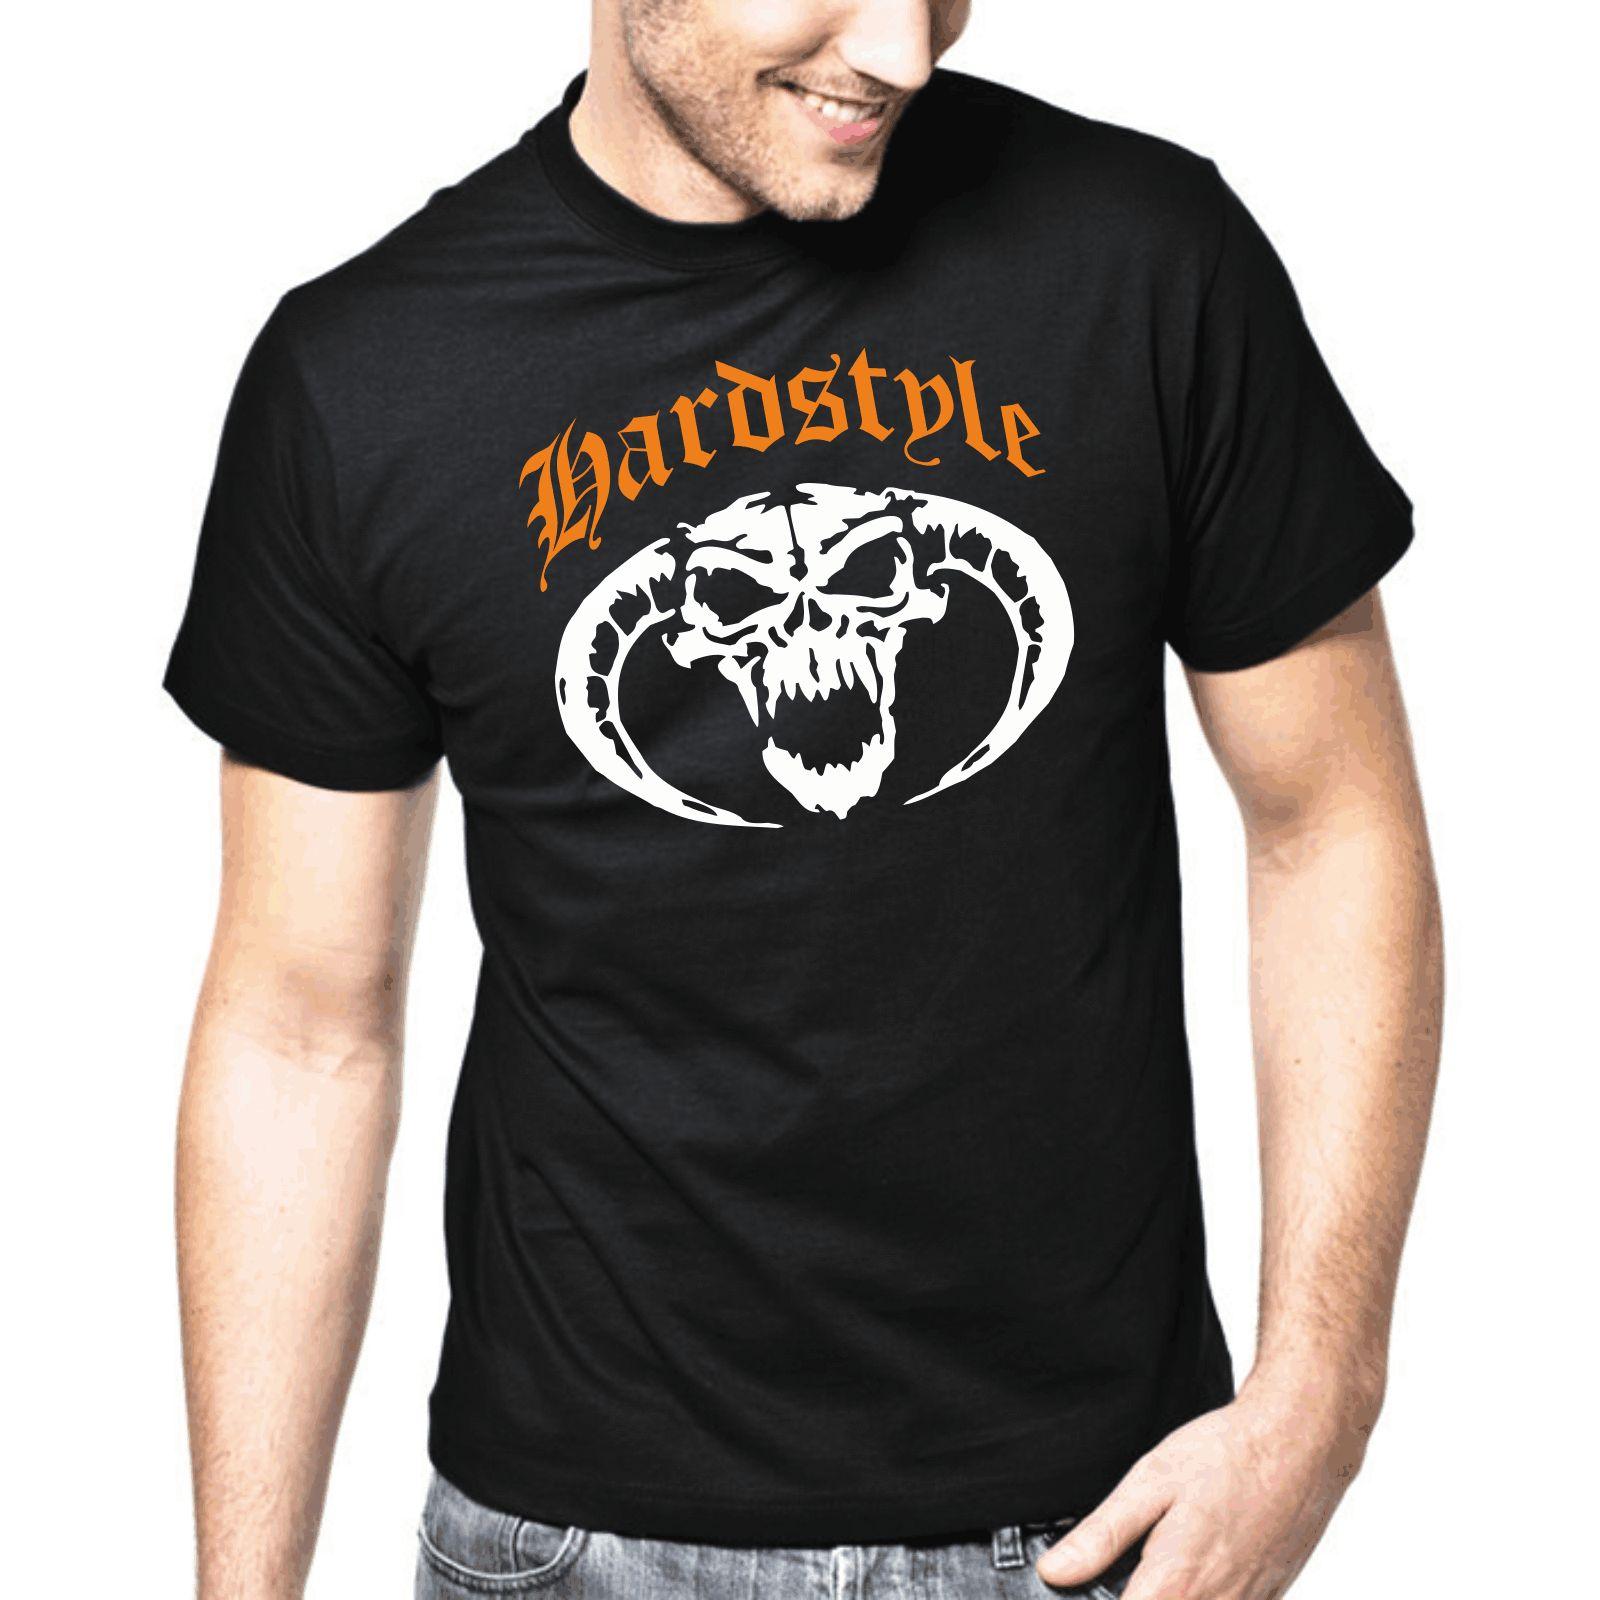 70dbc9b62d1980 Hardstyle Skull Gabber Hardcore Totenkopf Music Dj S Xxl T Shirt Tee Shirt  A Day Shop T Shirt Online From Fuyastore, $24.2| DHgate.Com